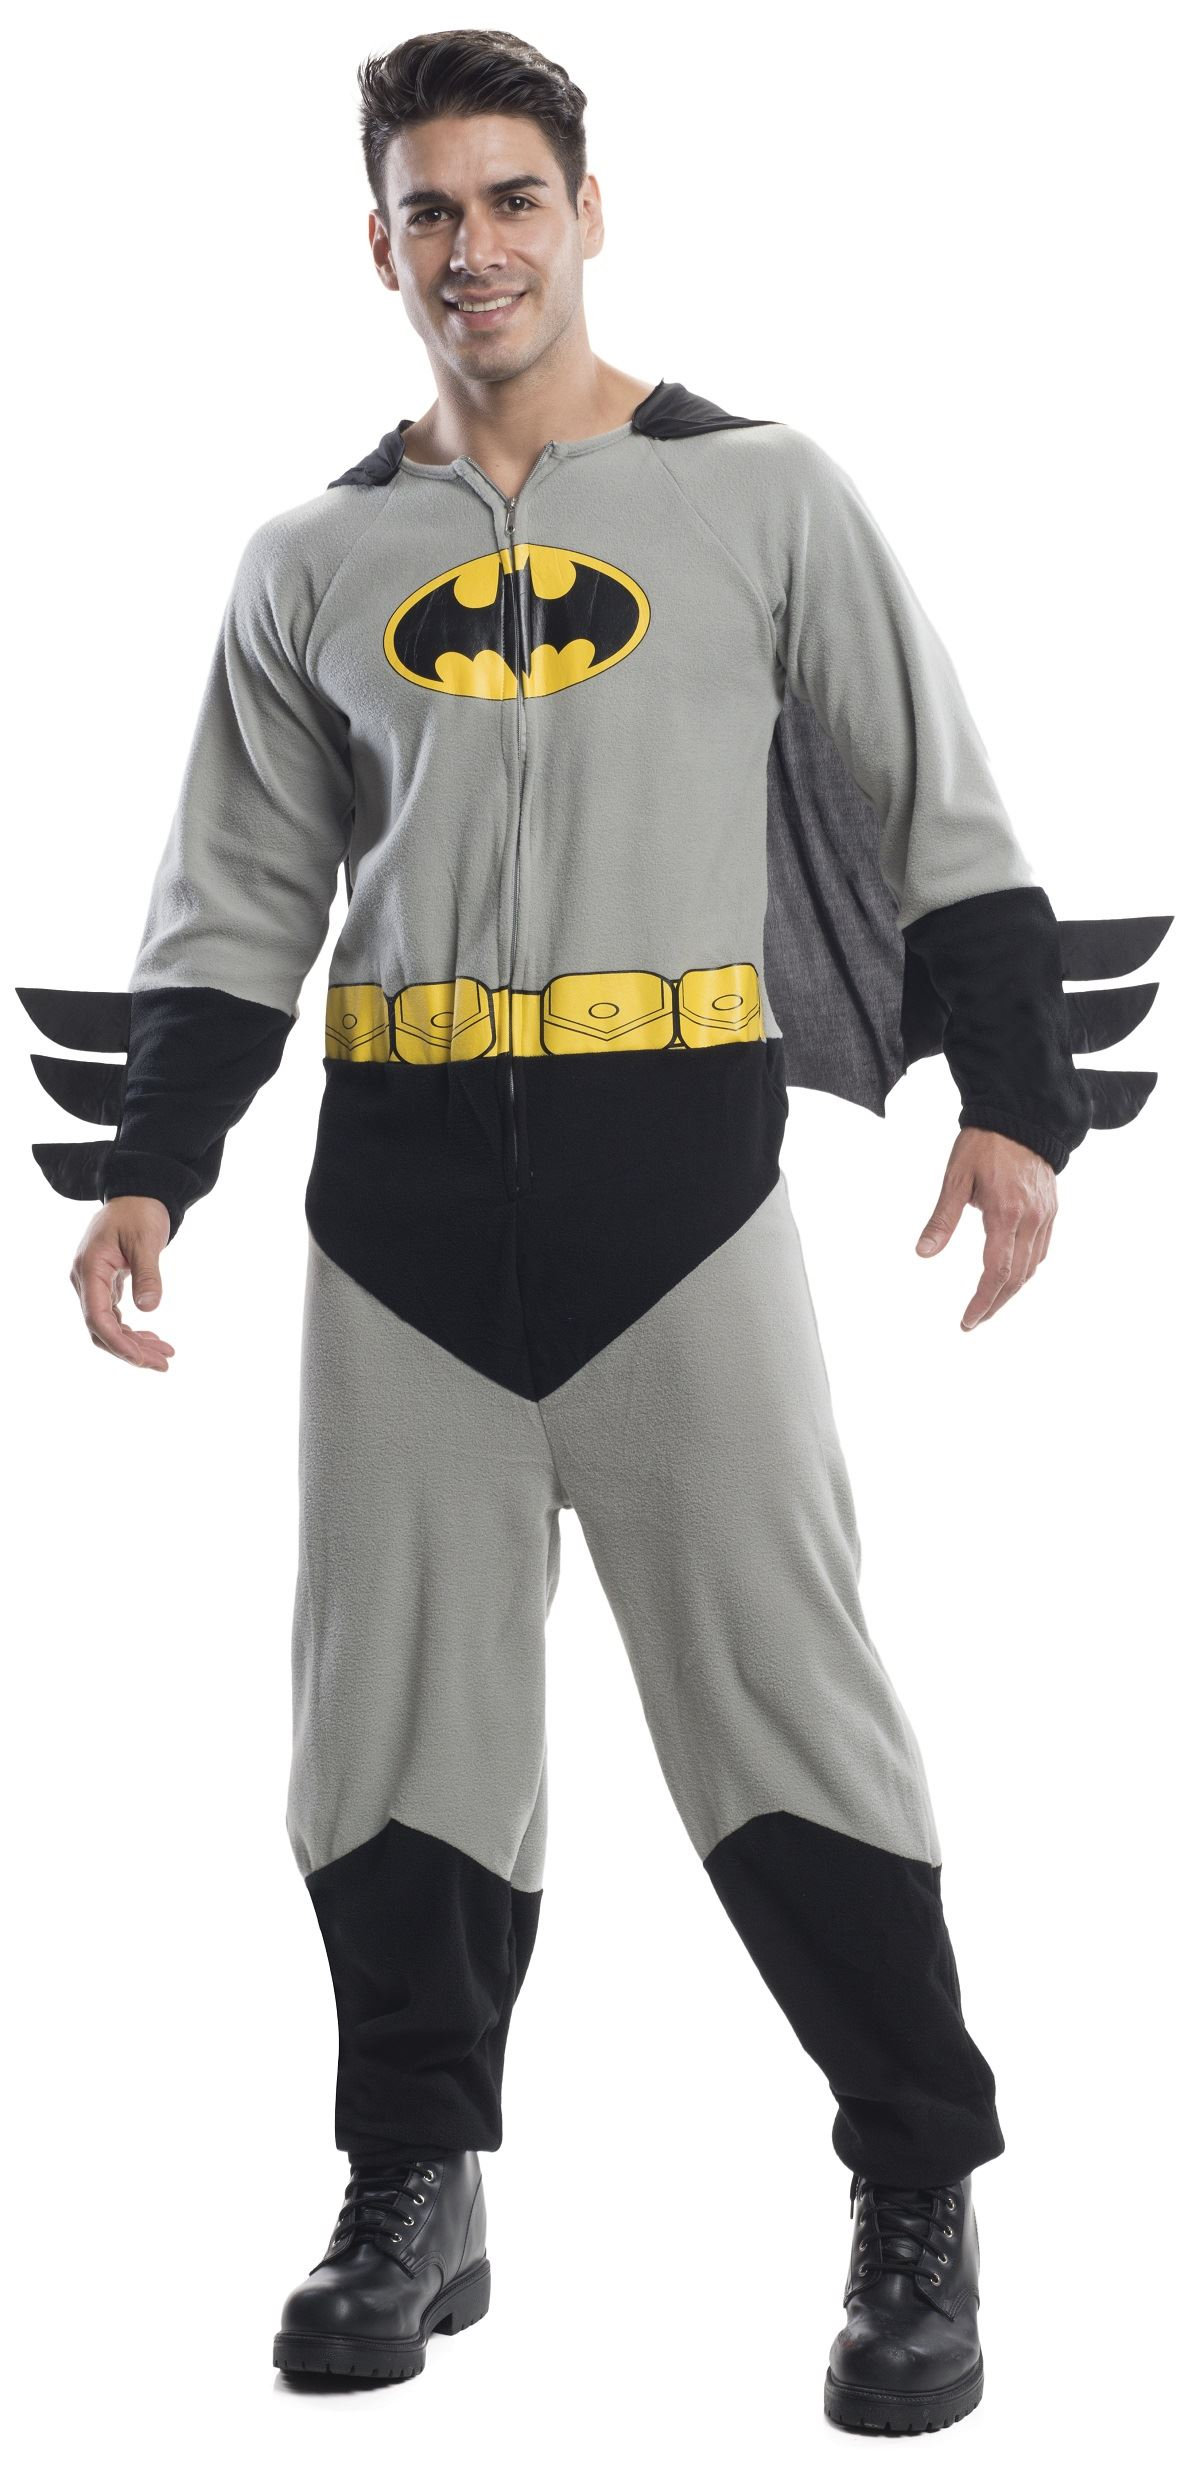 Adult Batman Onesie Men Costume  sc 1 st  The Costume Land & Adult Batman Onesie Men Costume   $49.99   The Costume Land